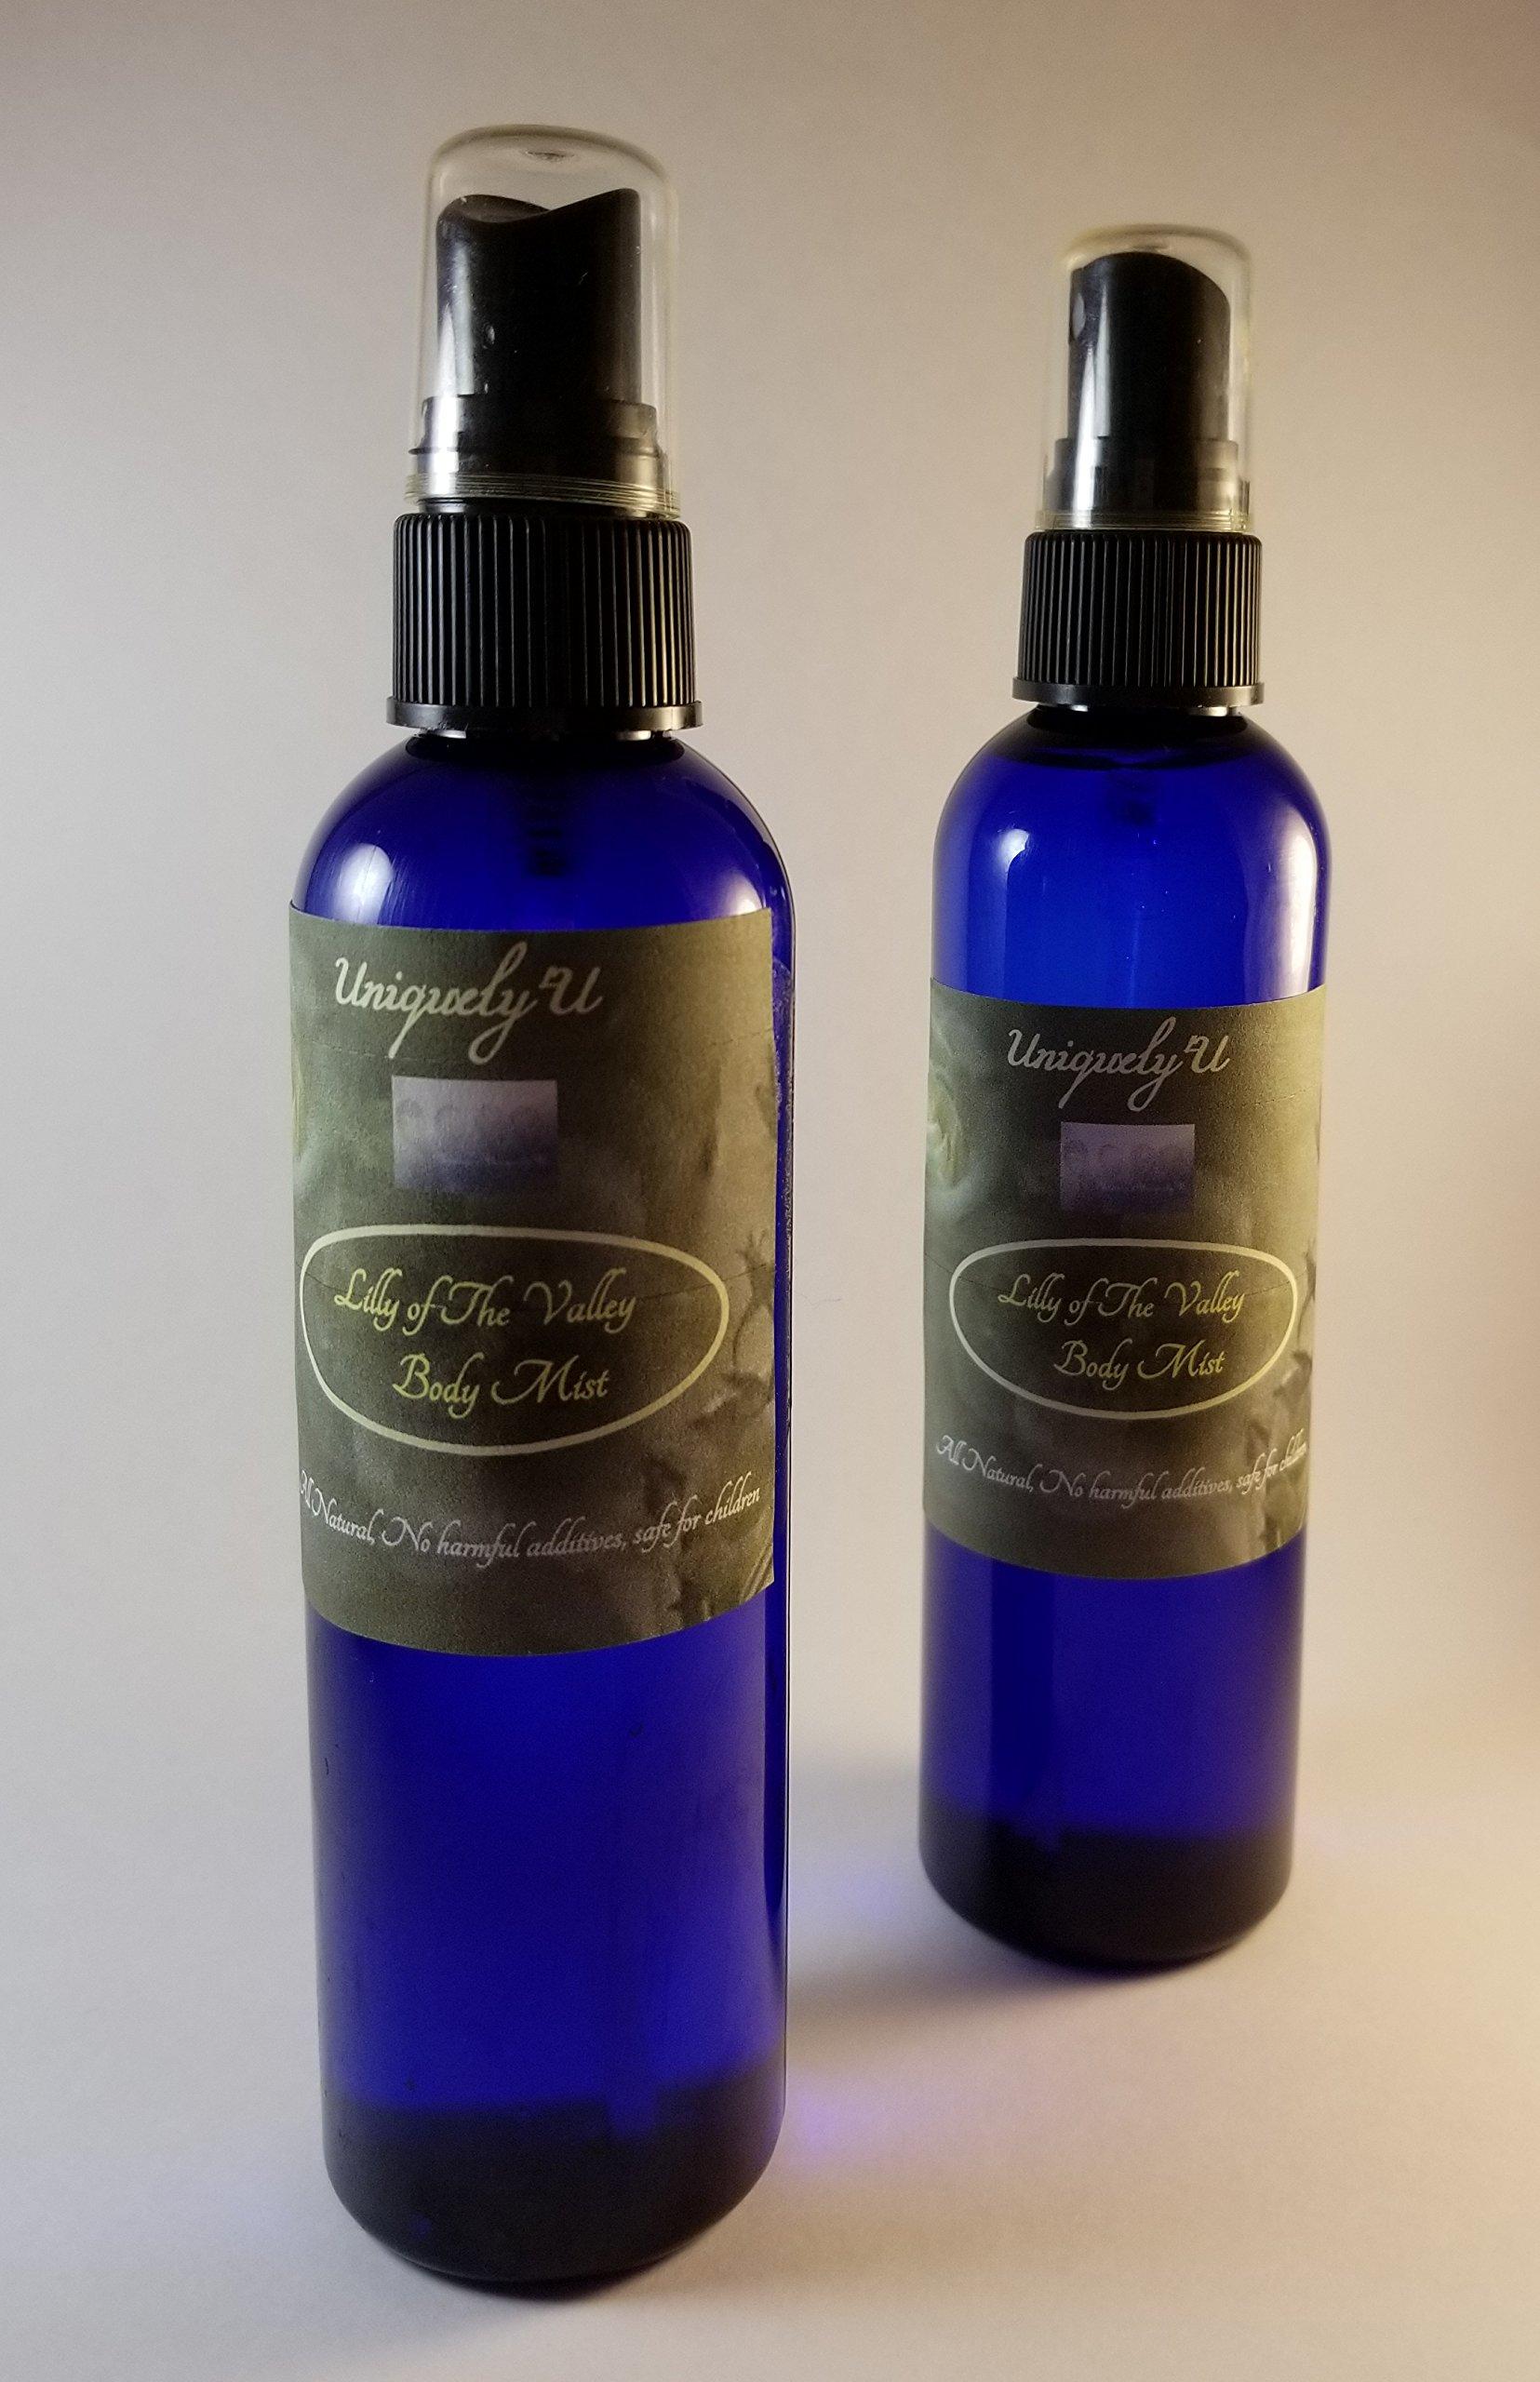 Uniquely'U Bath & Shower Body Mist, Room & Linen Spray DUO ''Lavender & Bali Mango''